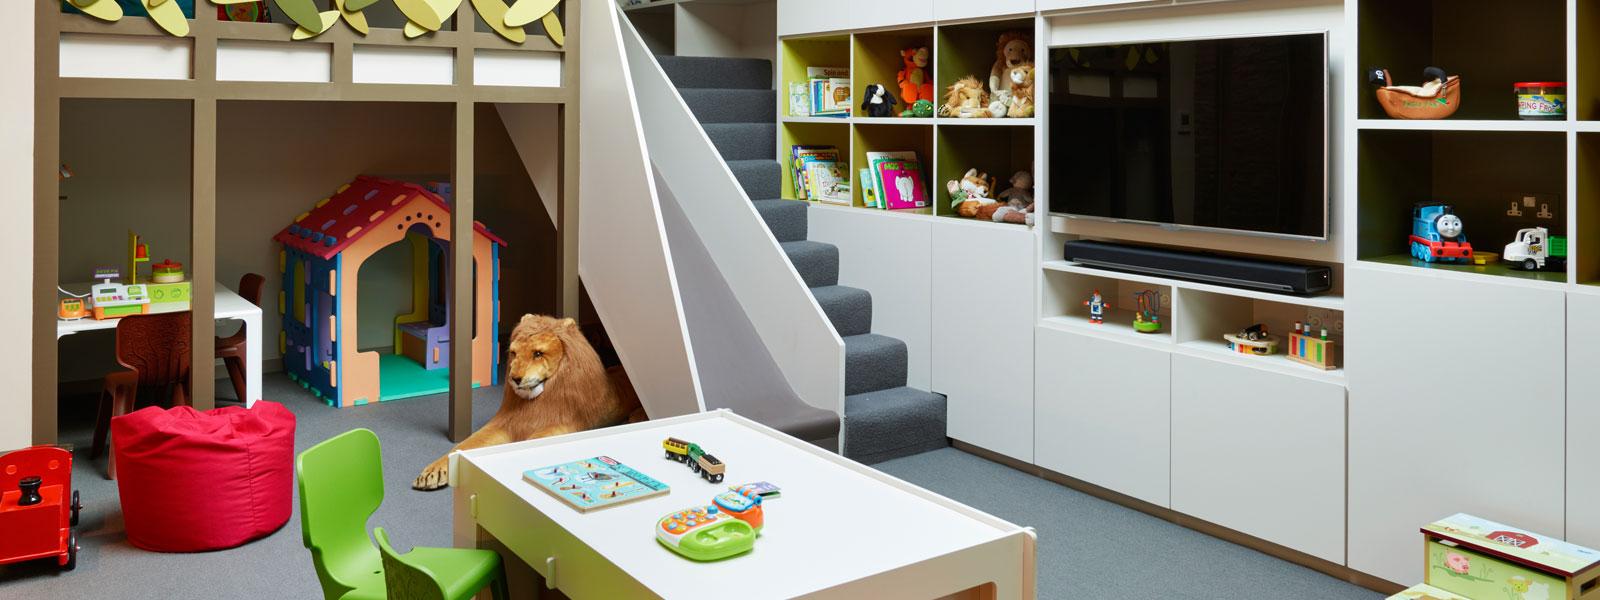 Ensoul under garden basement playroom mezzanine kids spaces